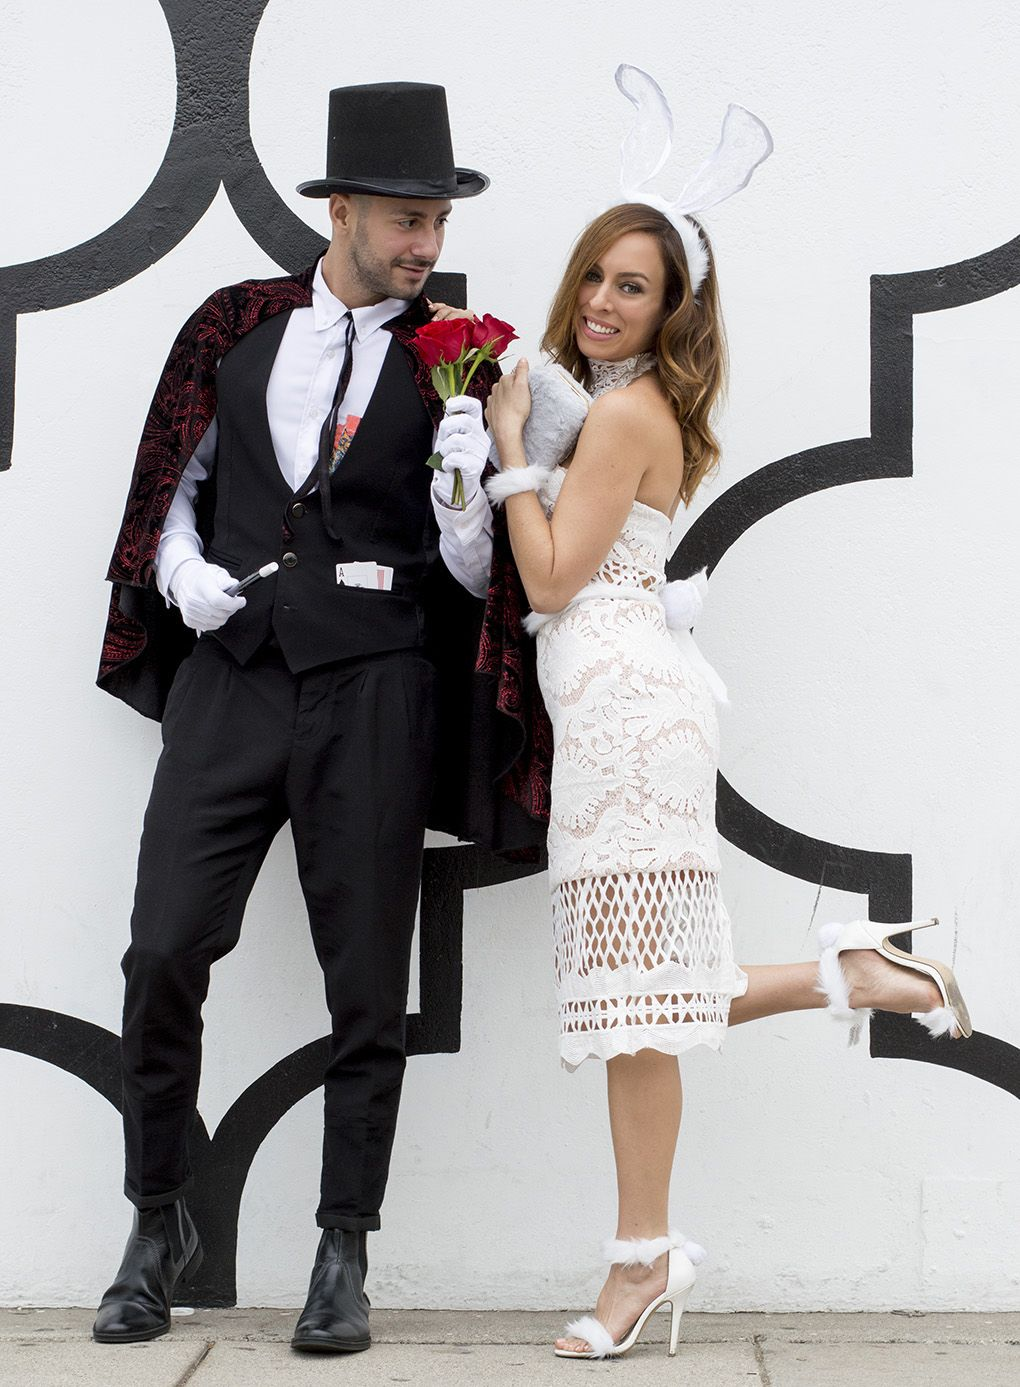 DIY Halloween classy couples costume ideas magician white